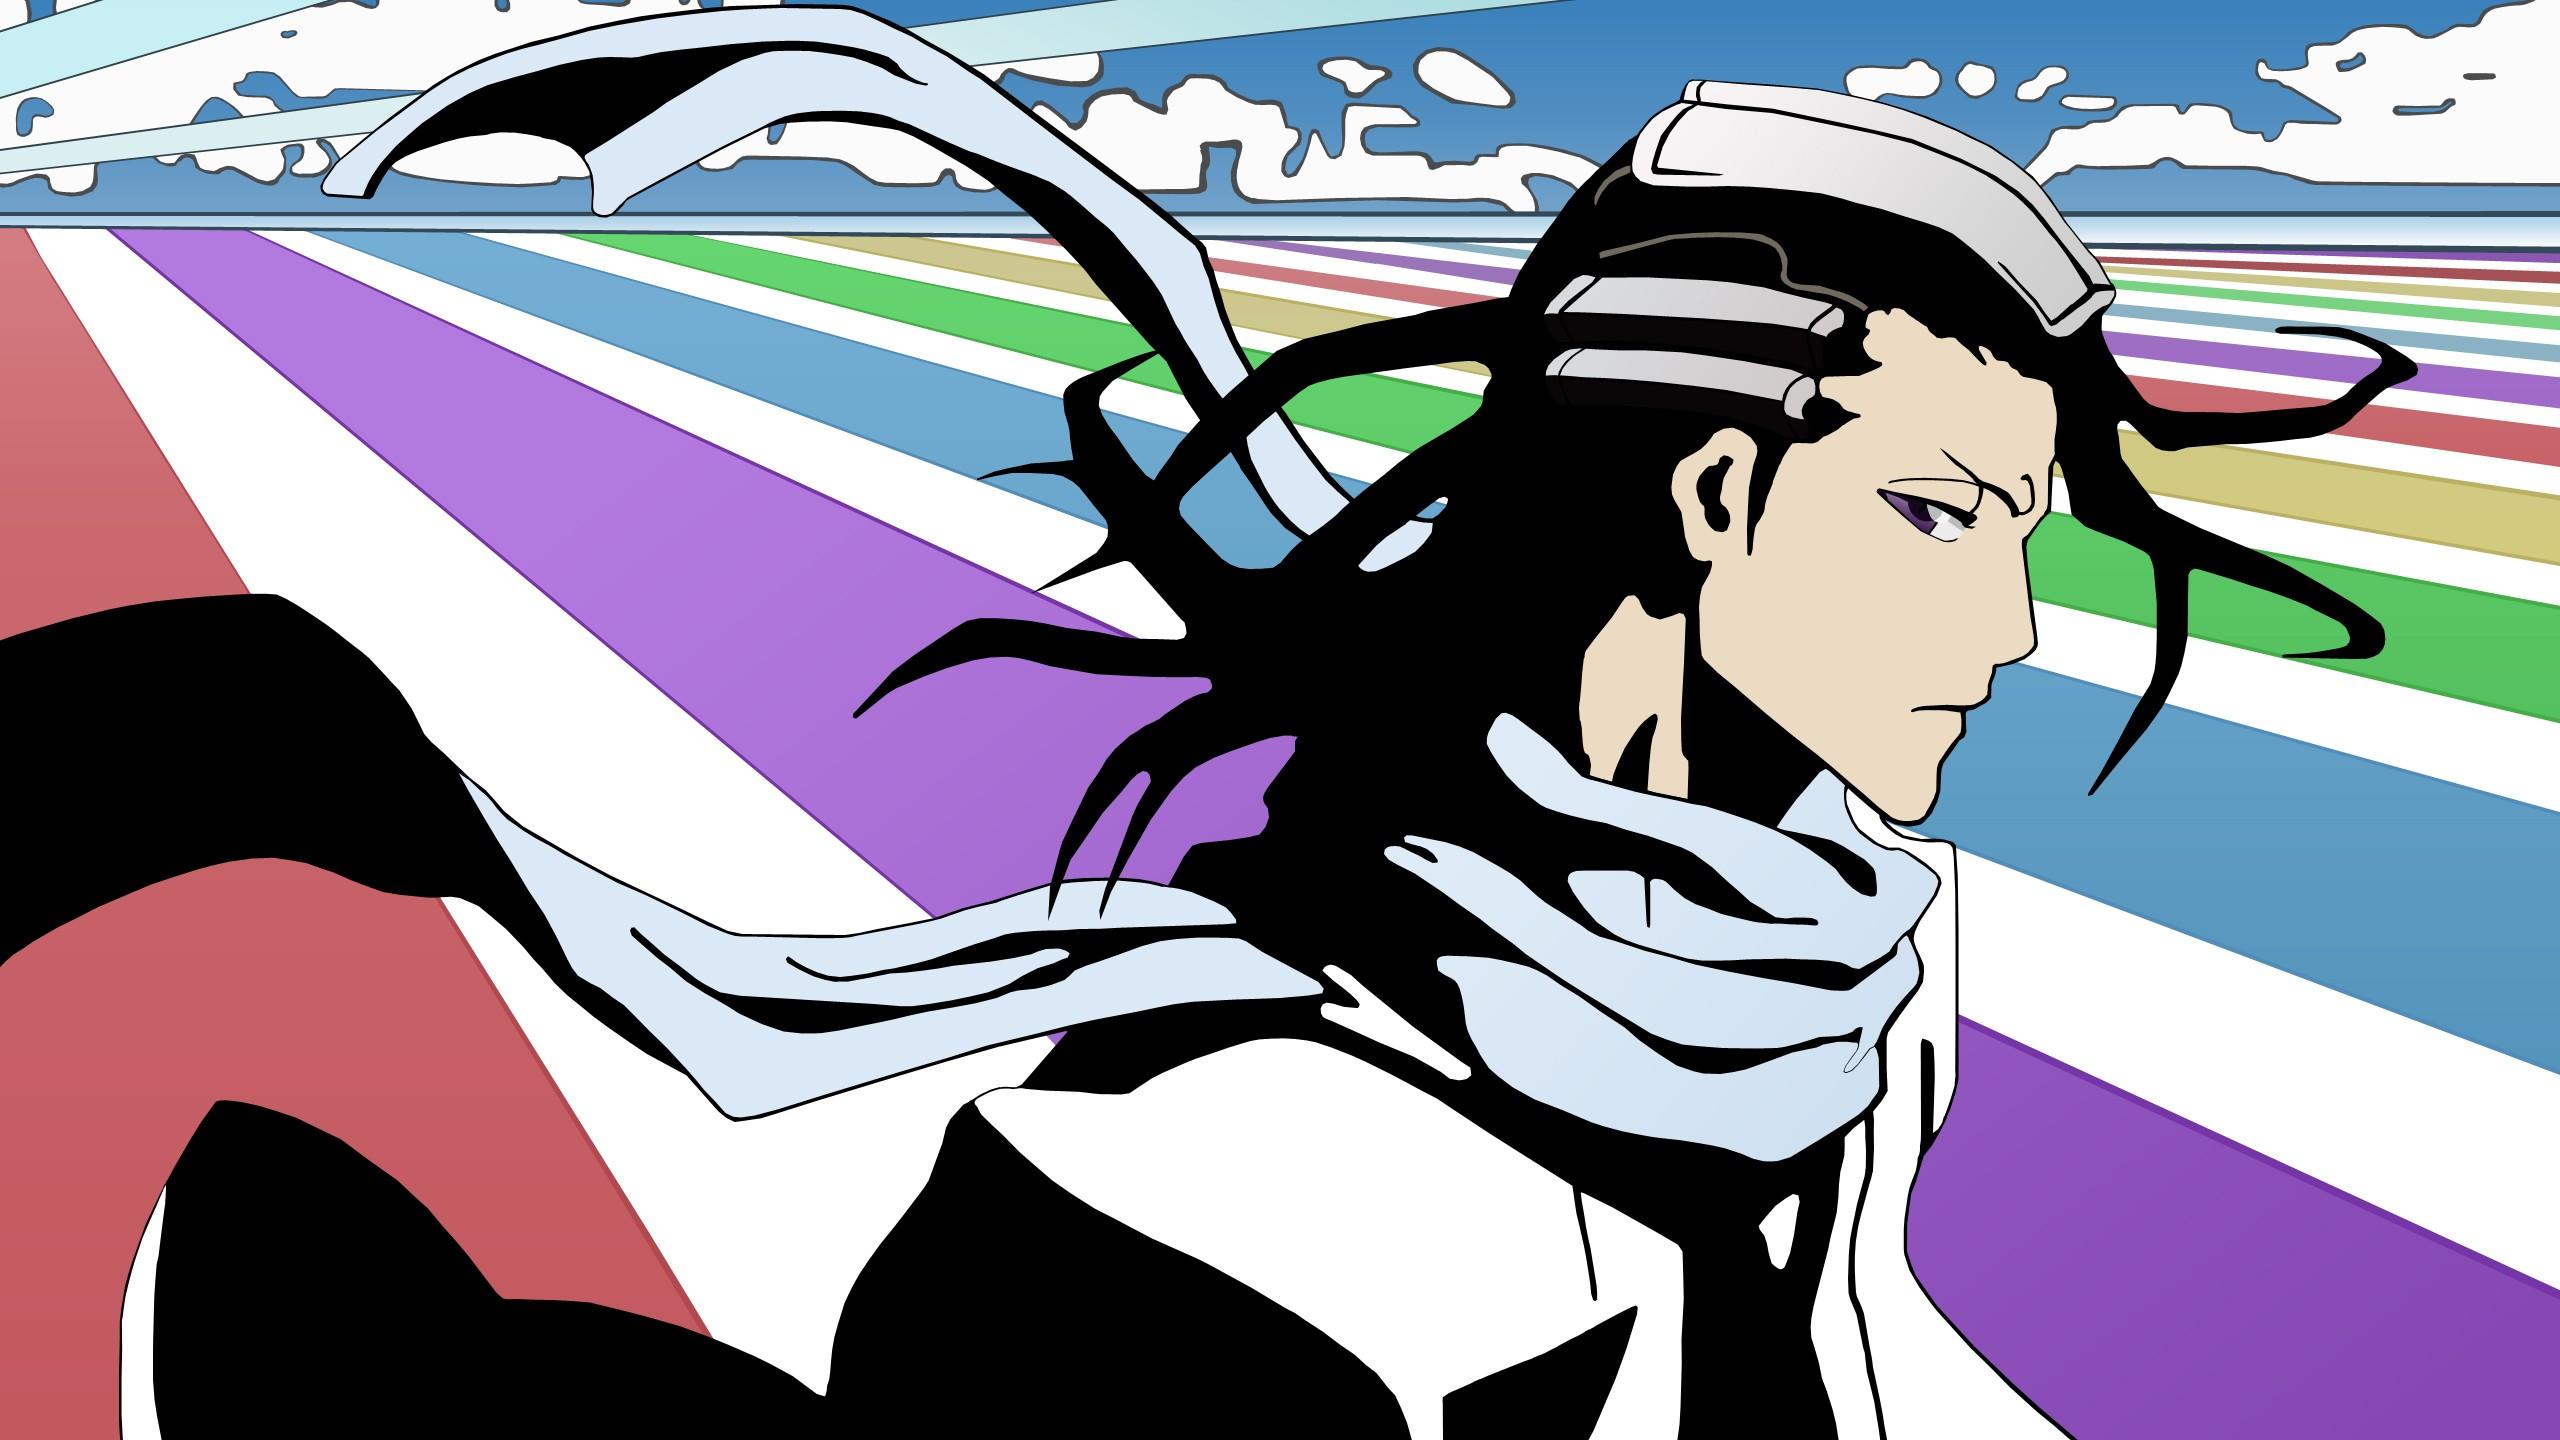 Anime 2560x1440 Bleach Kuchiki Byakuya anime vectors anime